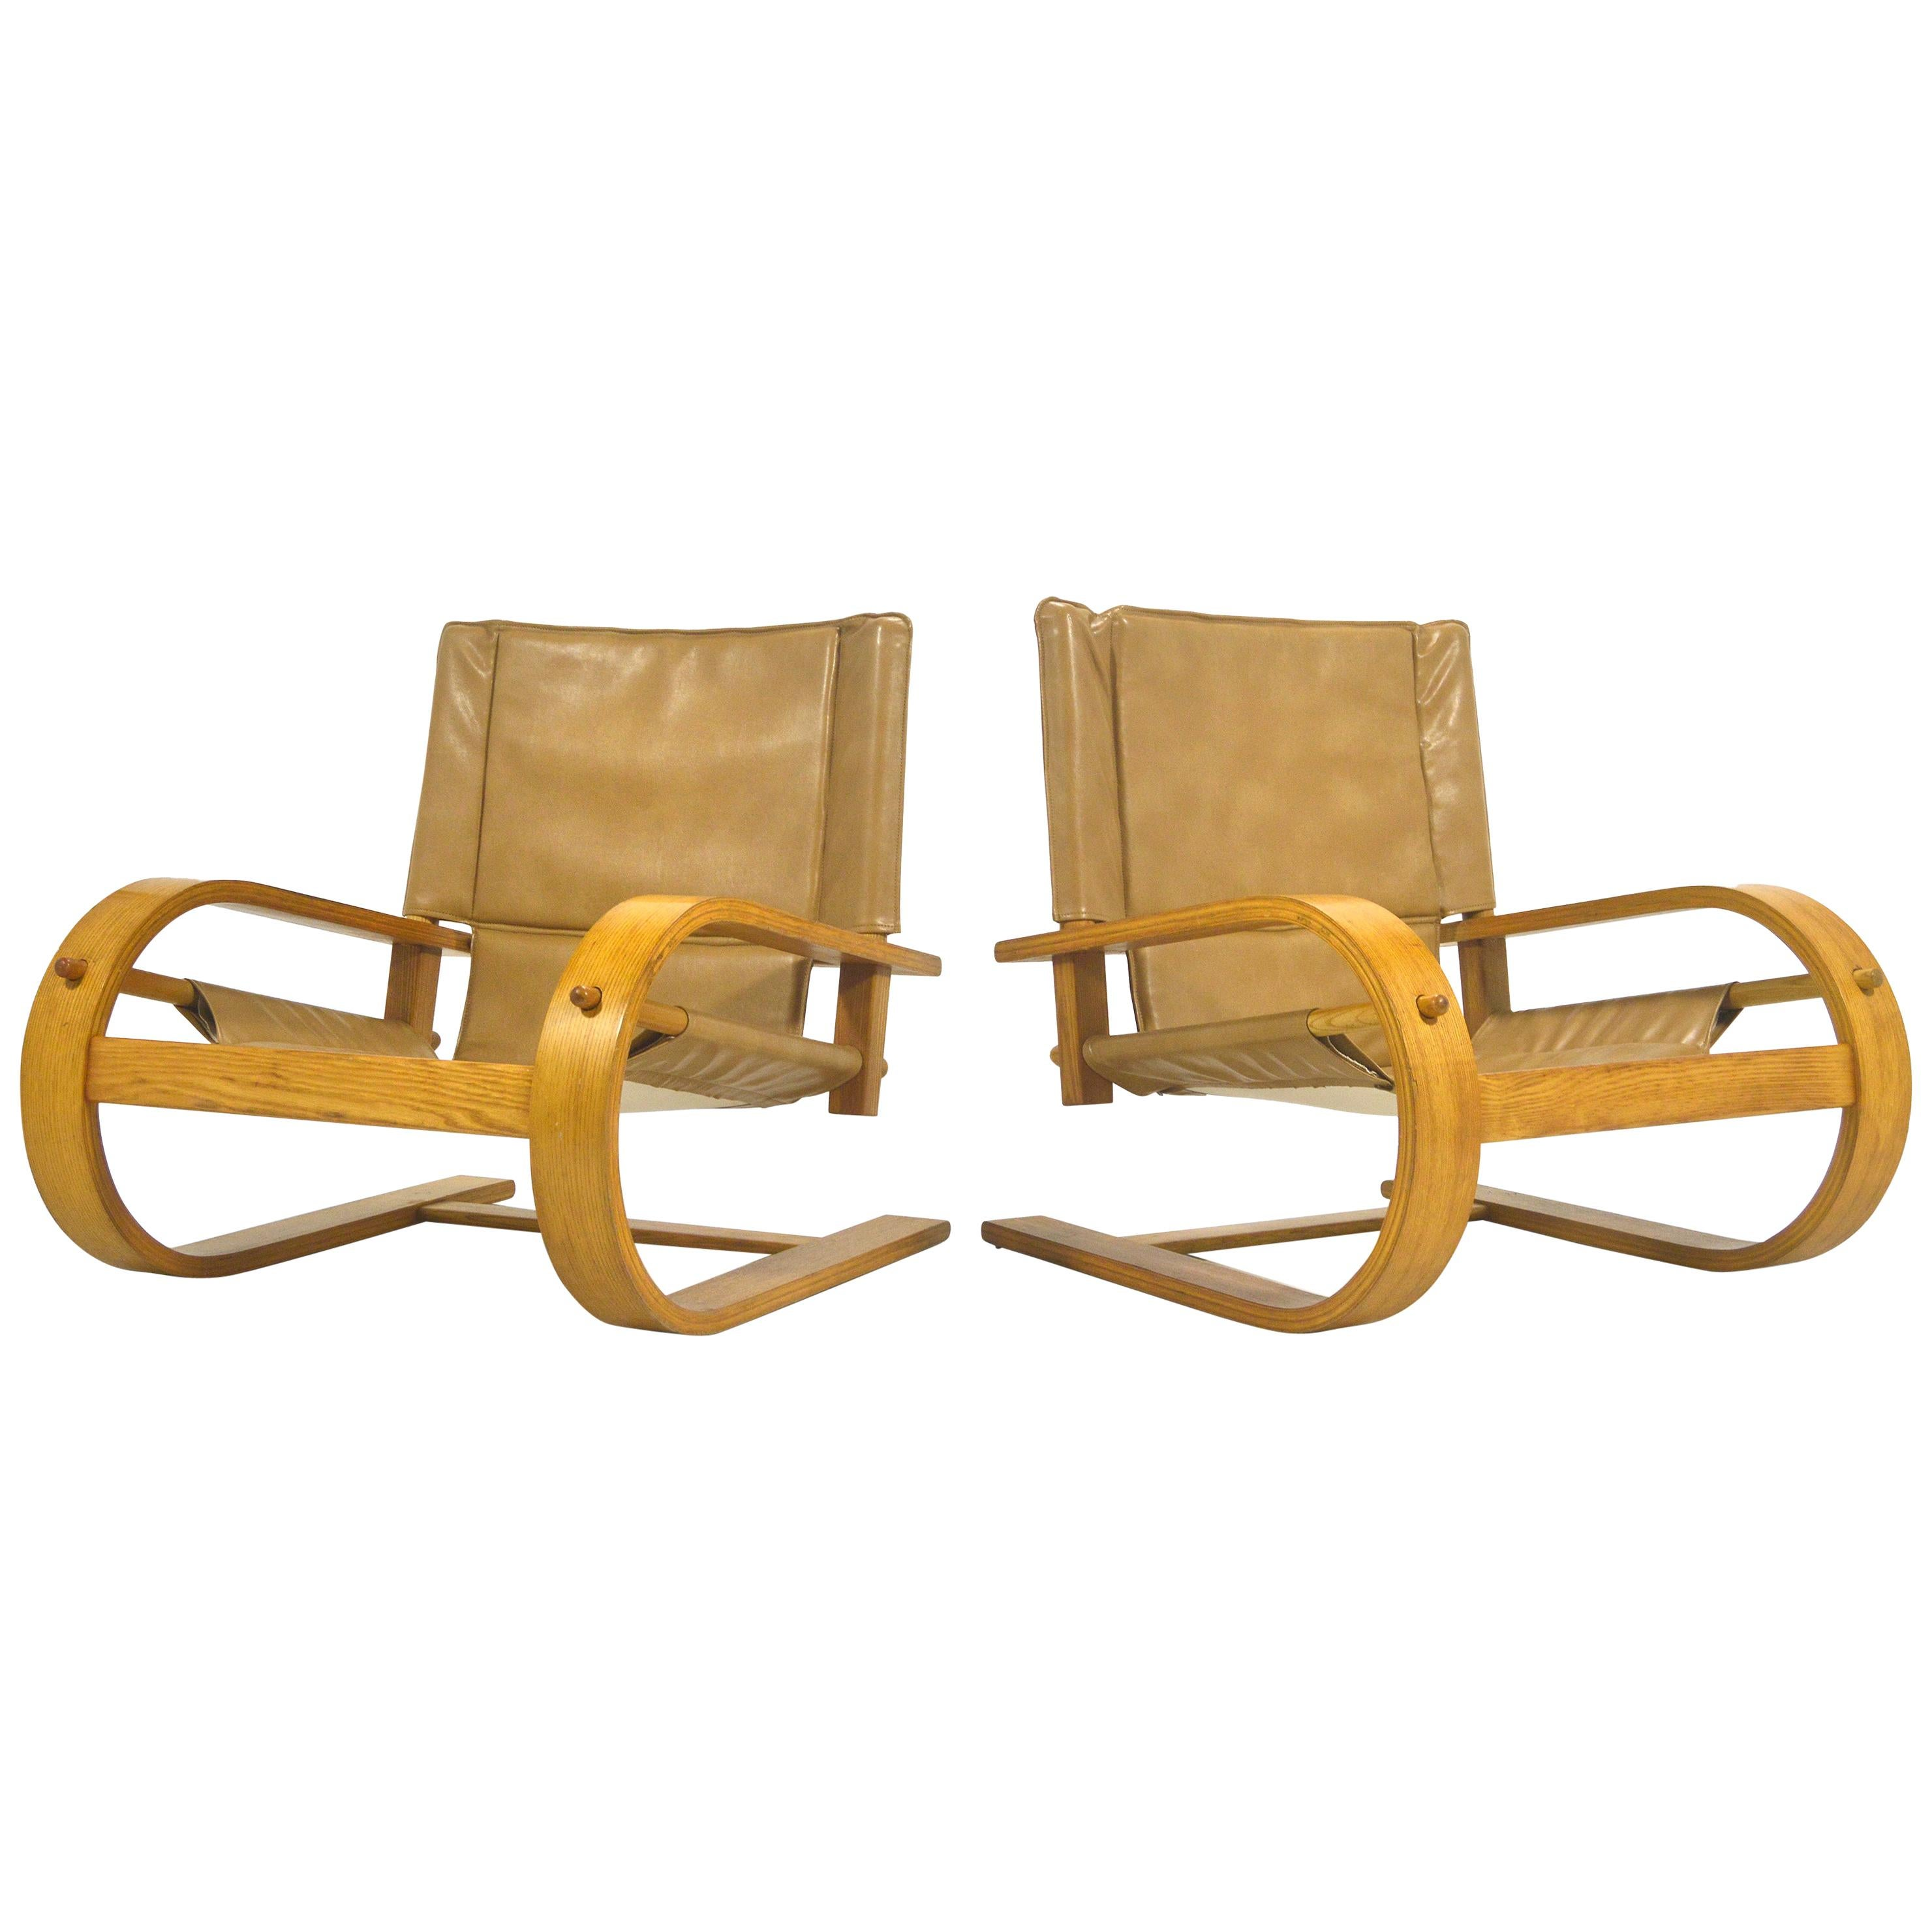 "Pair of ""Scacciapensieri"" Chairs by De Pas, D'Urbino and Lomazzi for Poltronova"